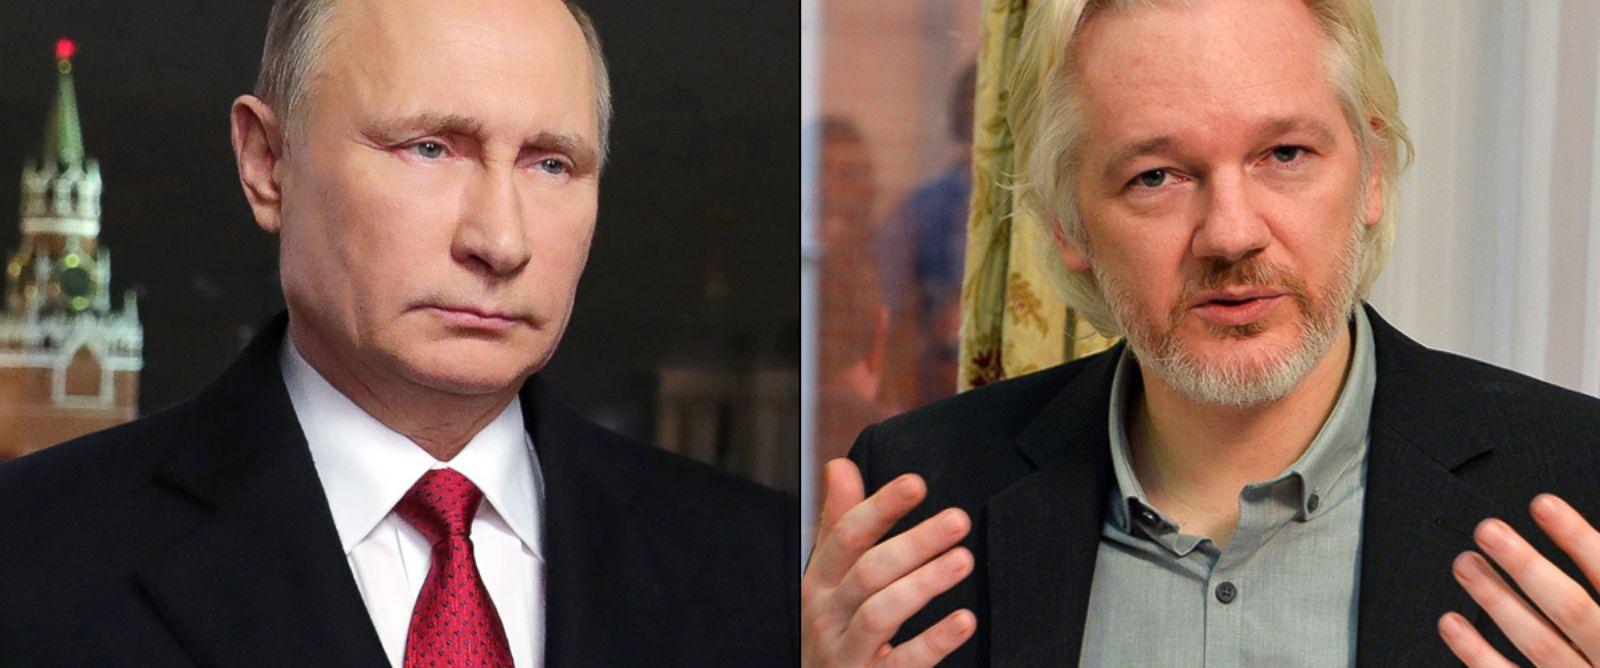 Многие факты говорят о связи Ассанжа с Россией Фото: wonkette.com